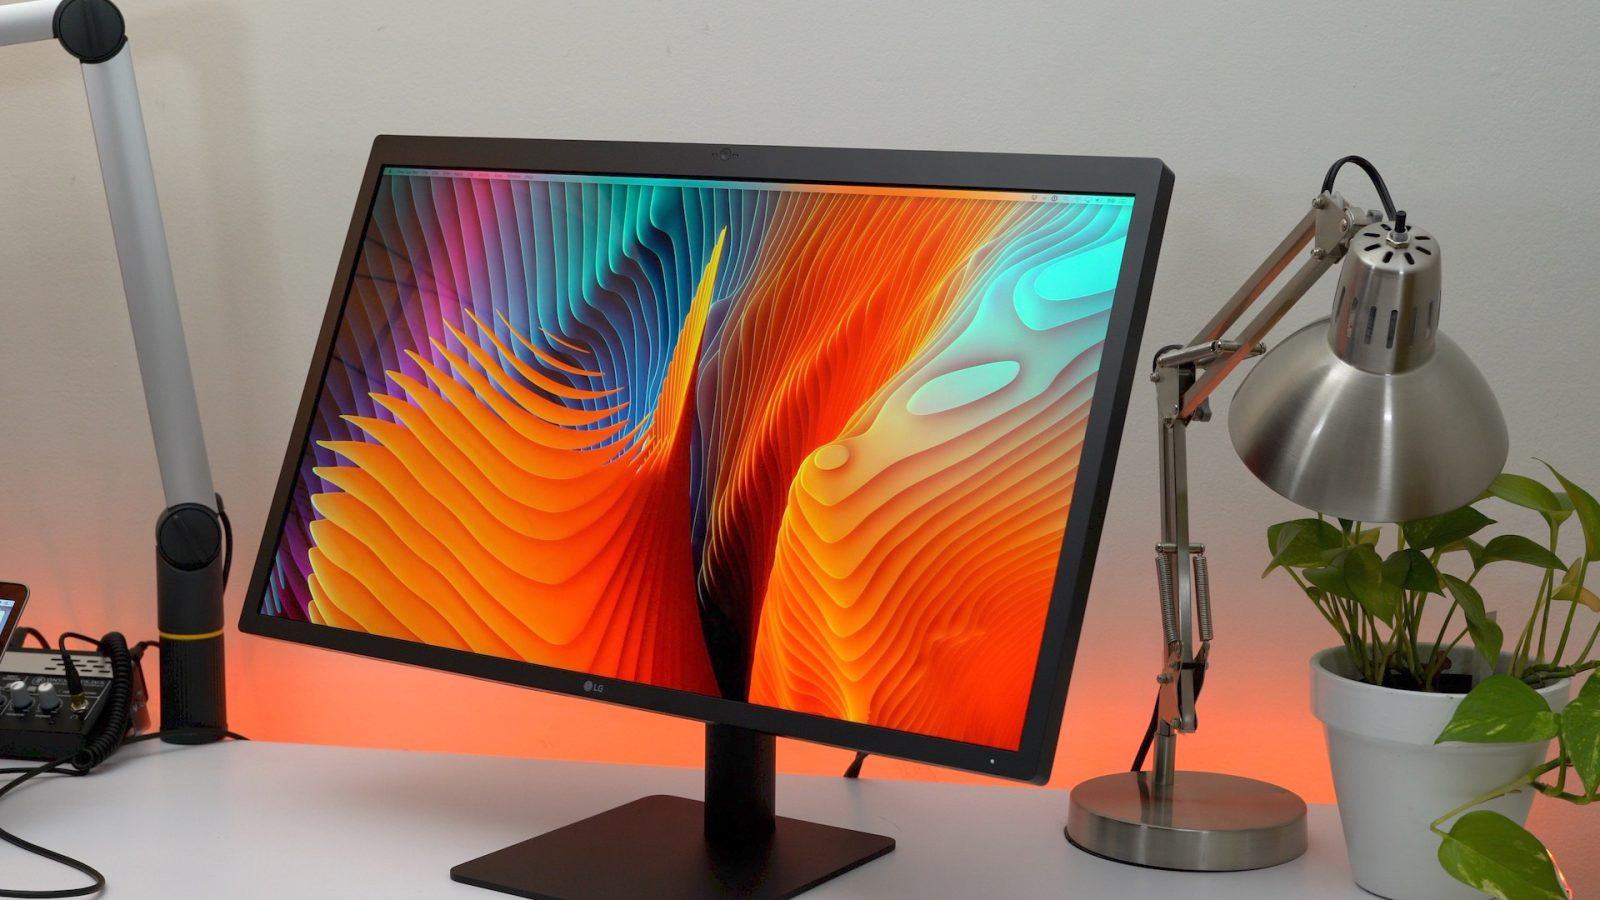 Ultra Fine LG 4K Apple Display